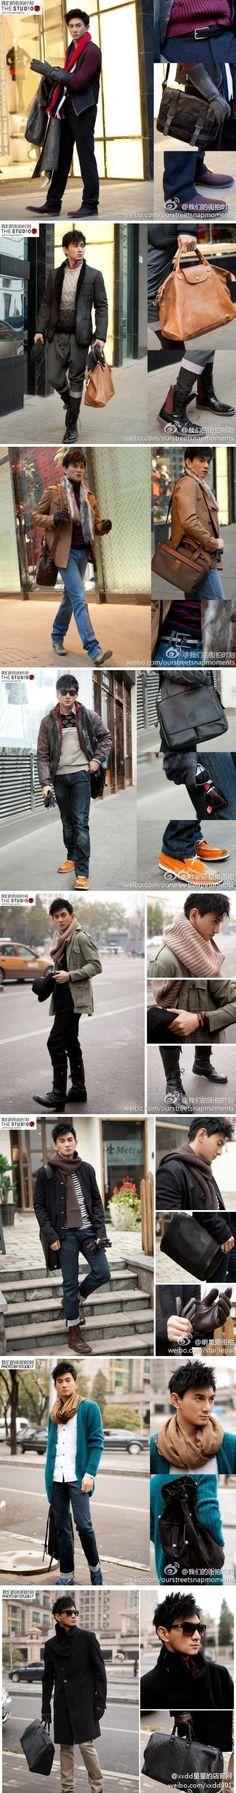 Nicky Wu street shoot.